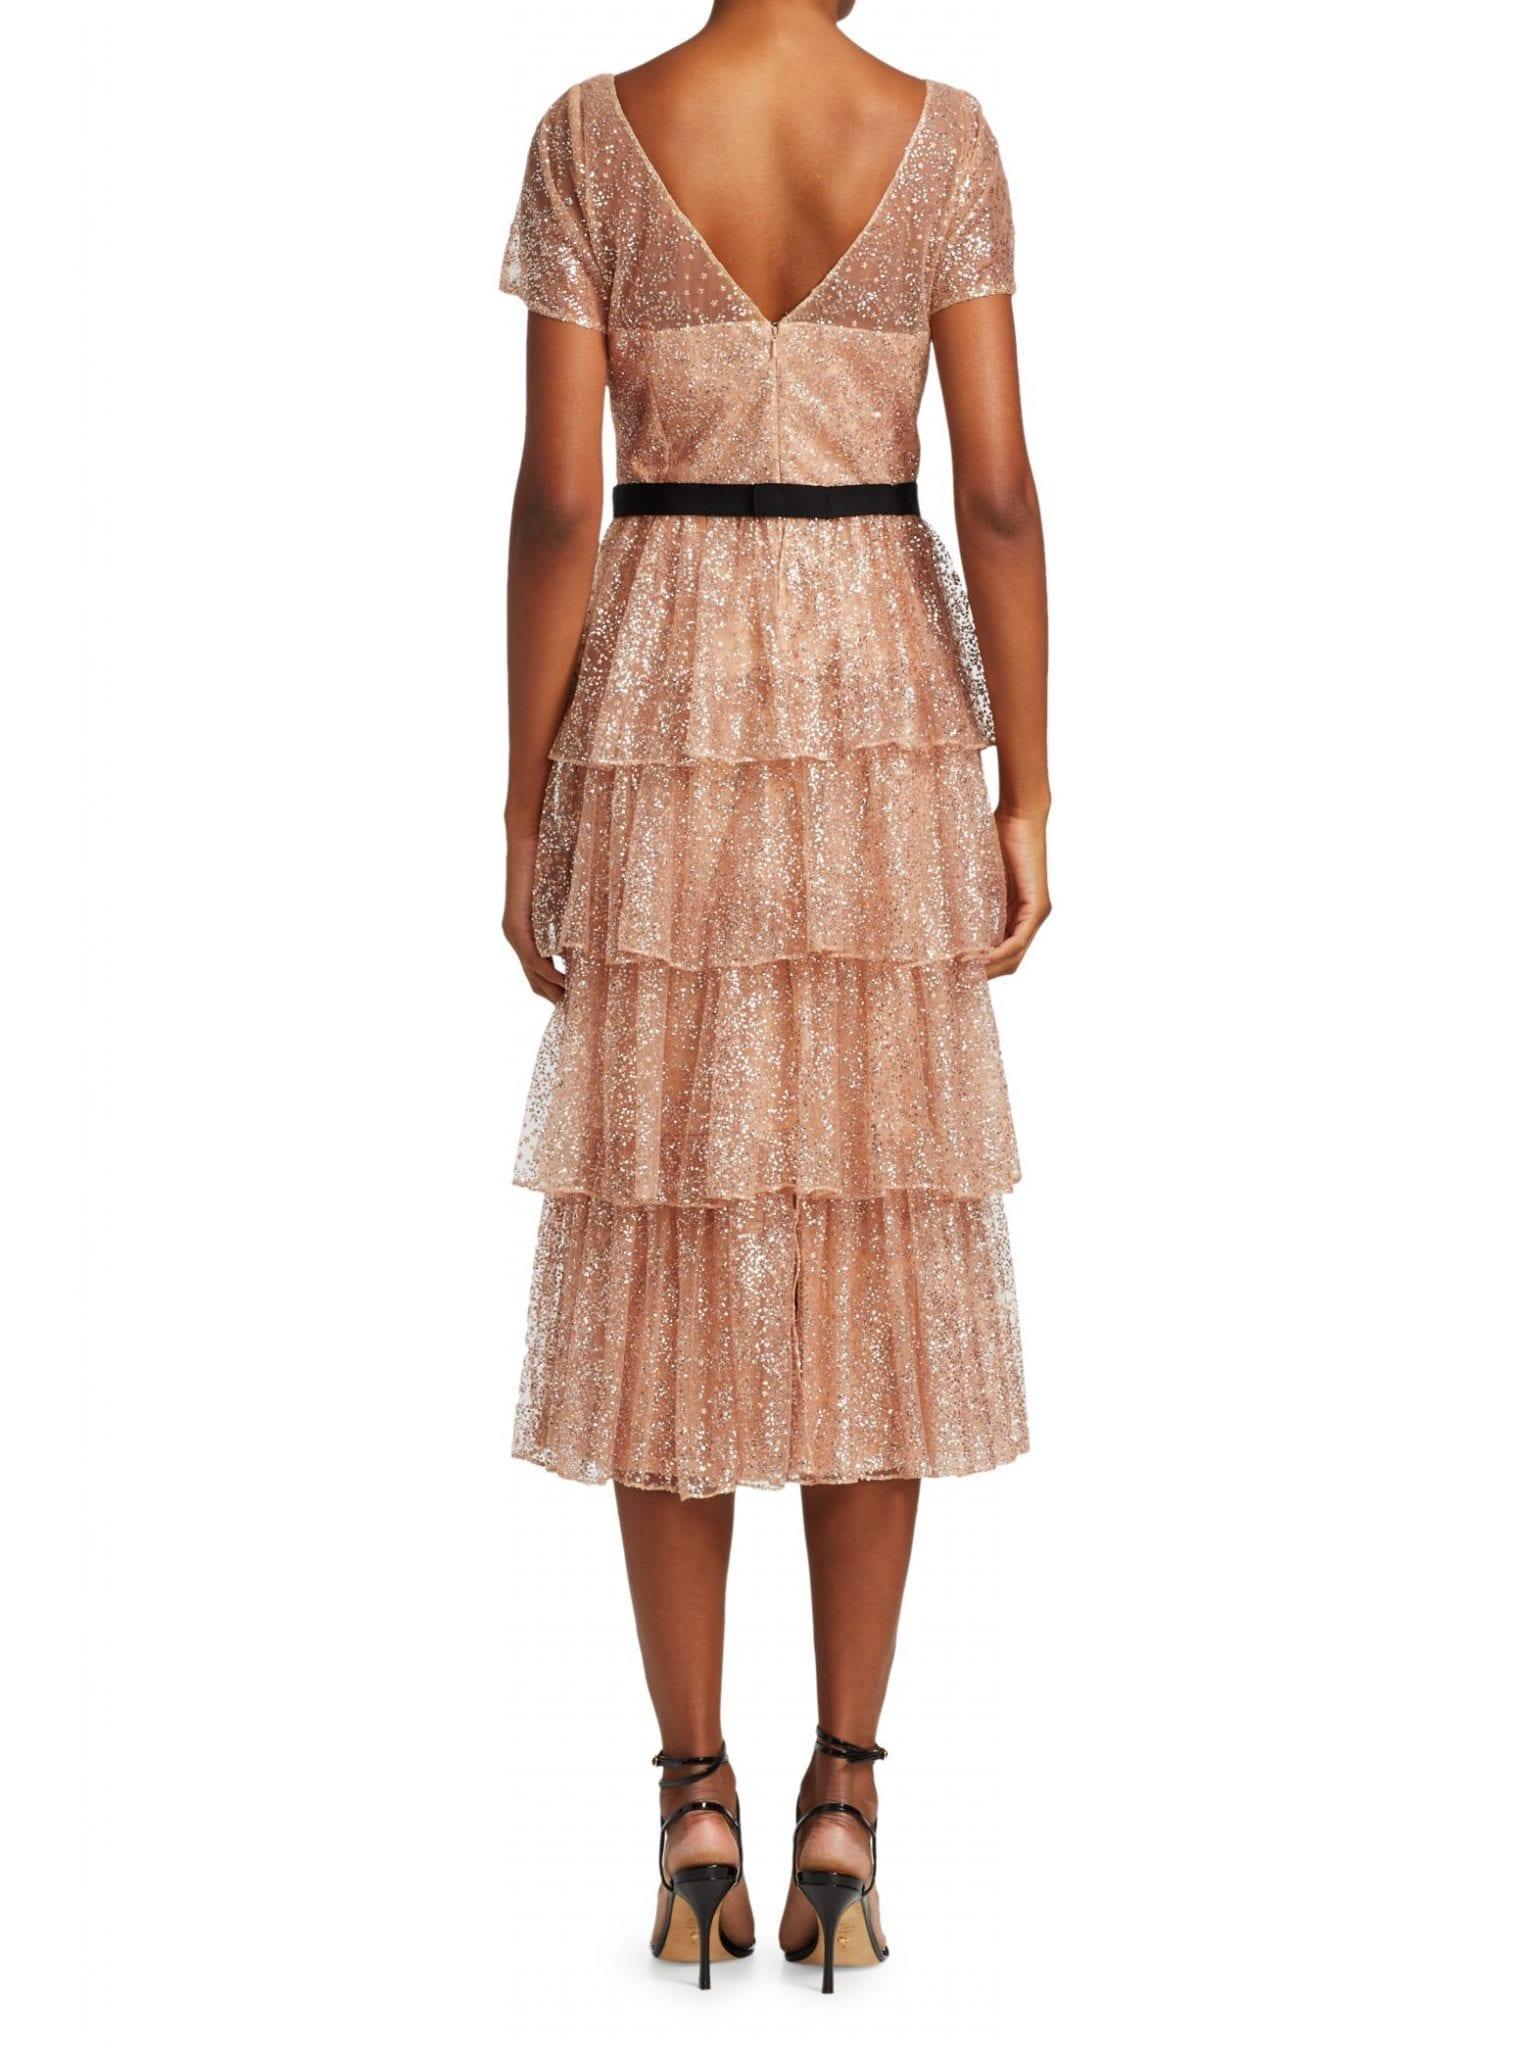 MARCHESA NOTTE Off-The-Shoulder Embroidered Dress